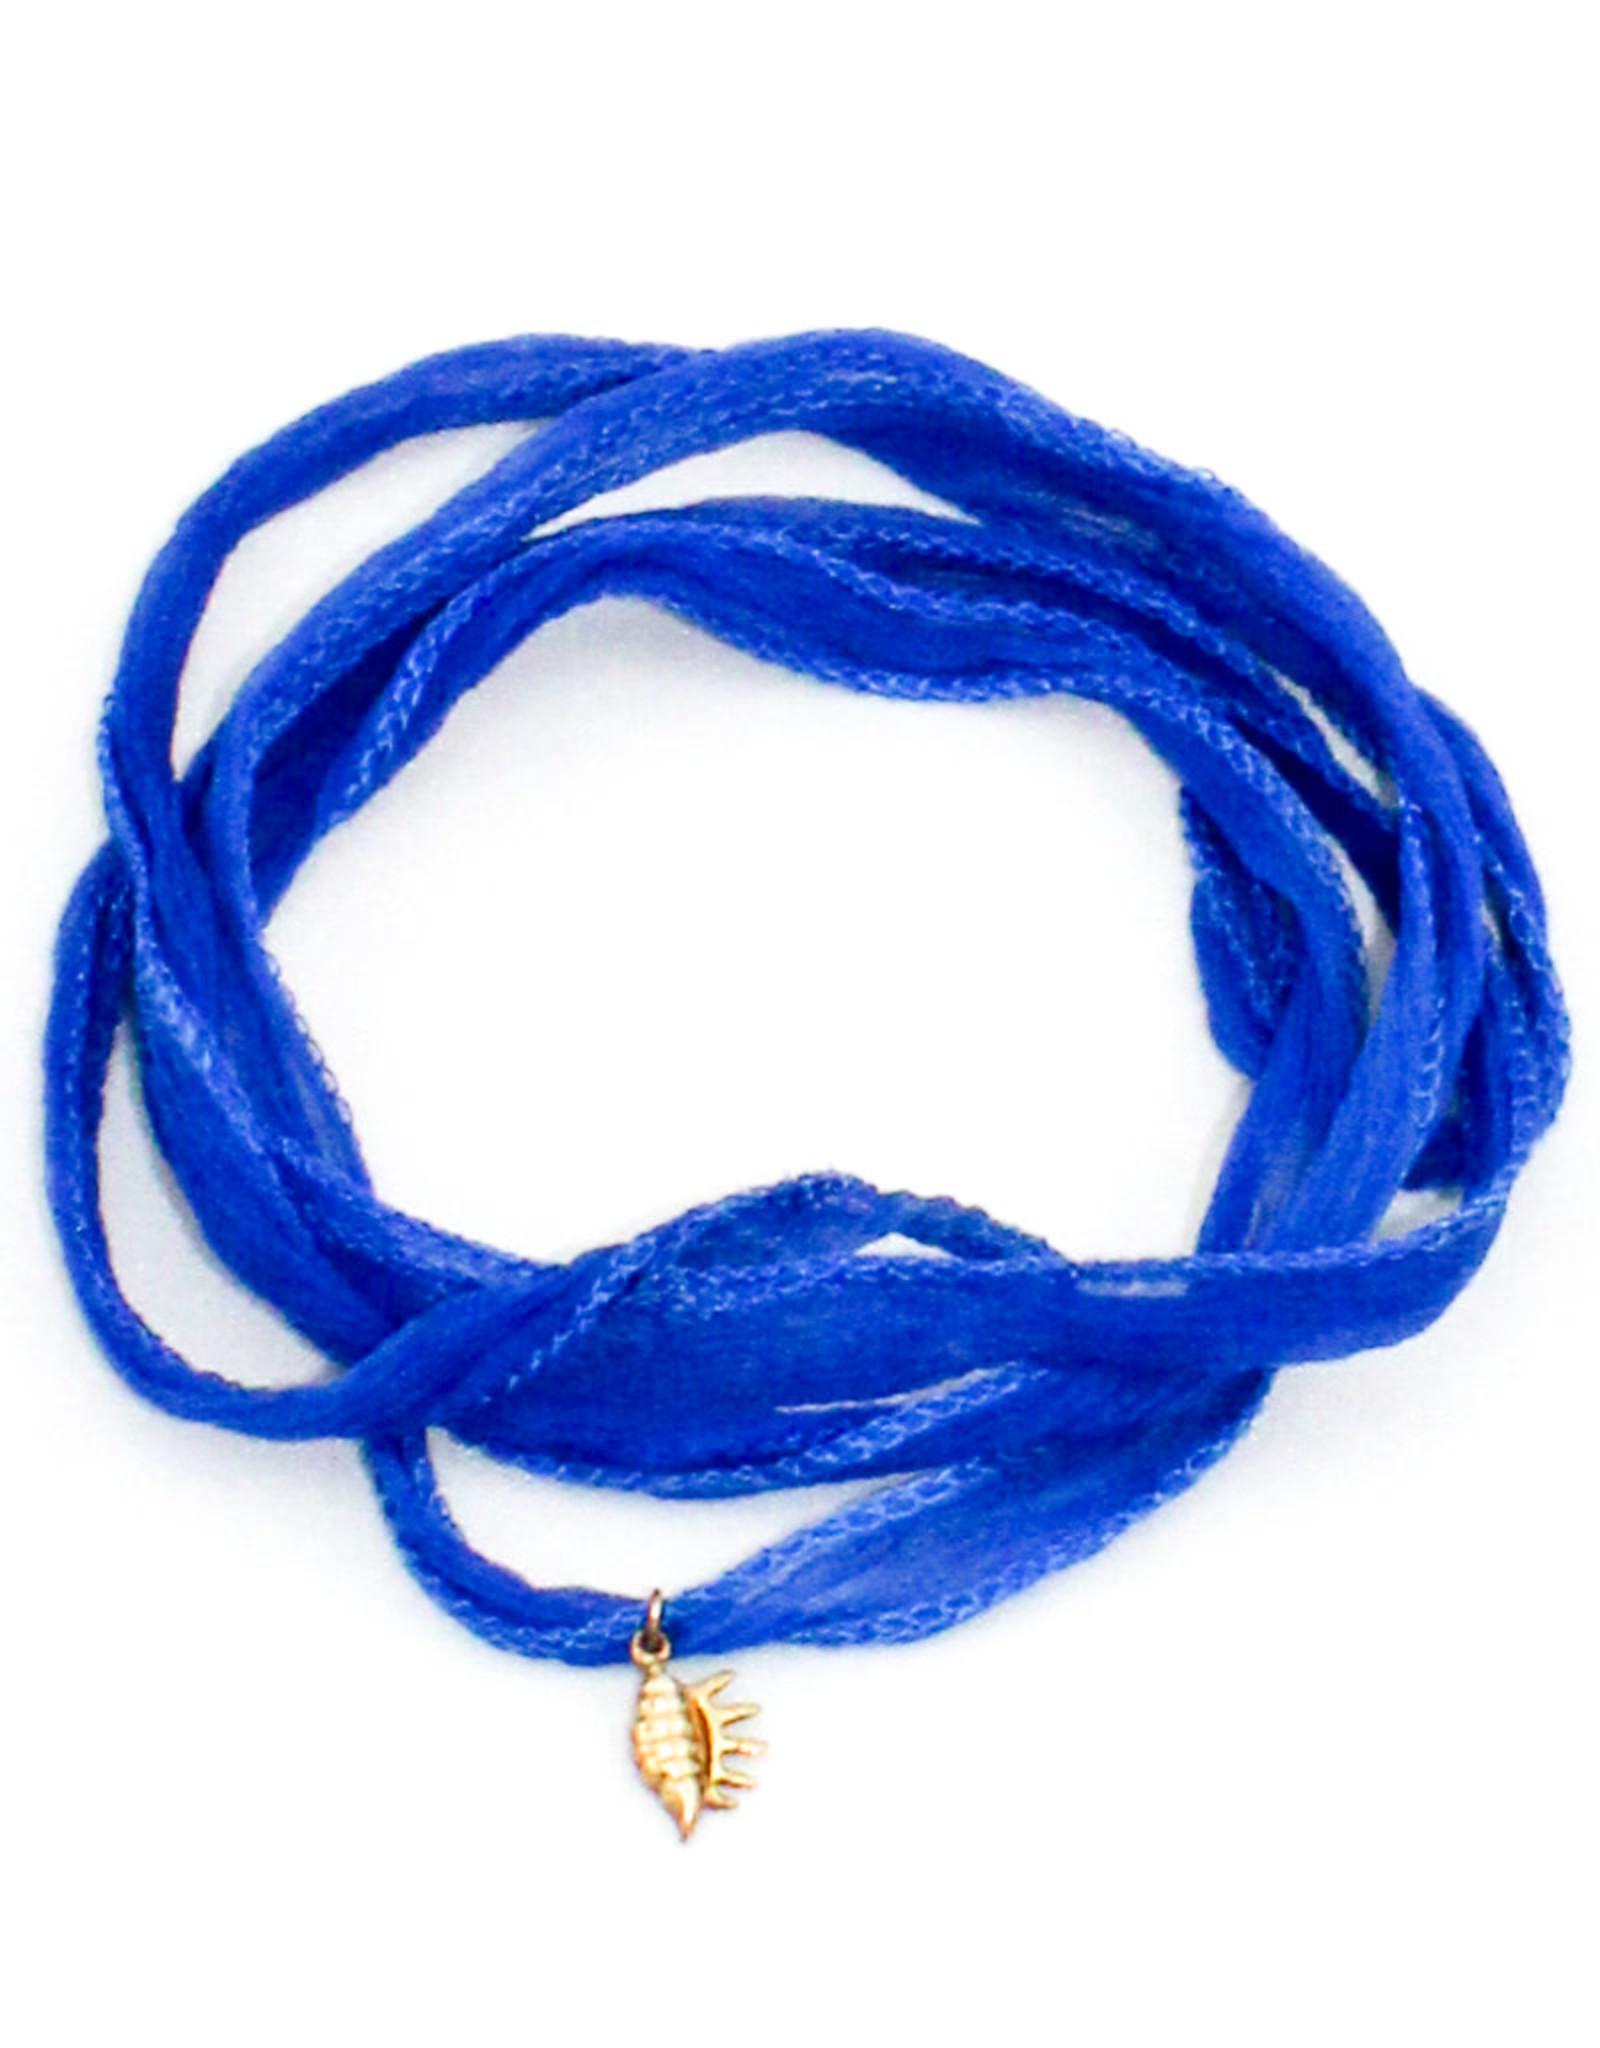 Crunchy Diva Designs Hand-Dyed Silk Wrap Bracelet